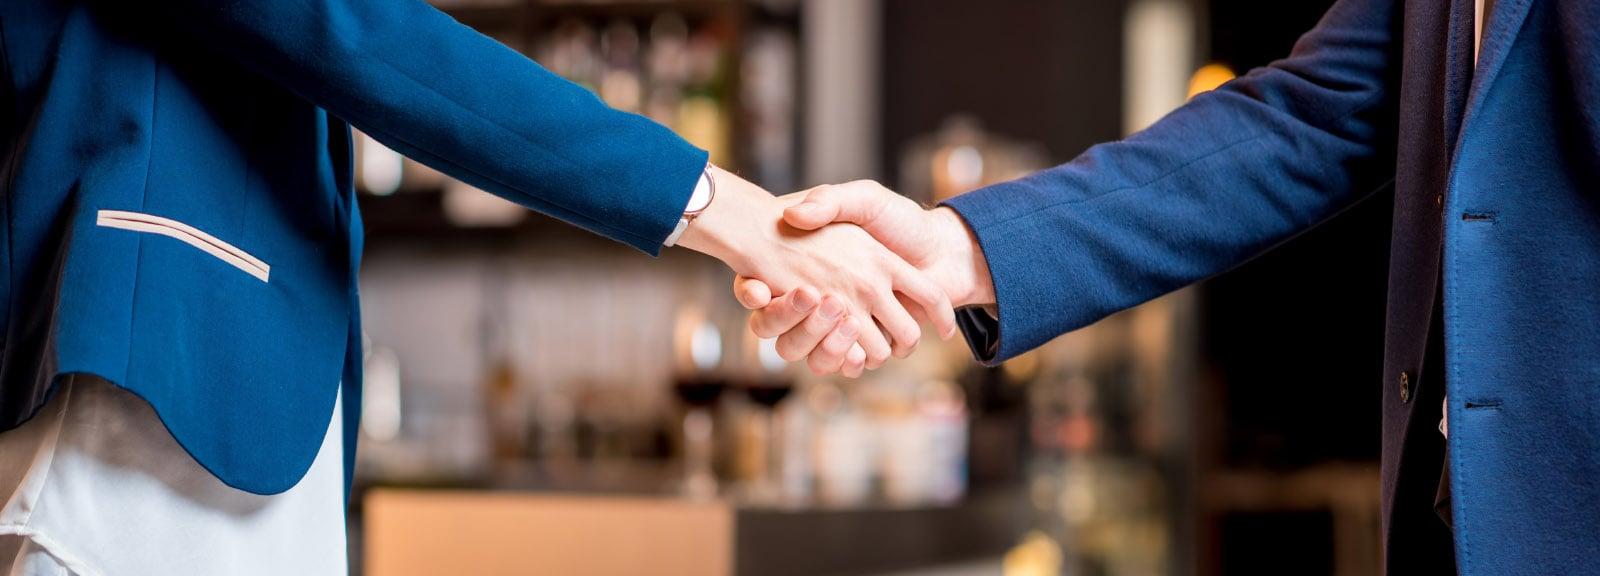 Handshake between business partners at cafe